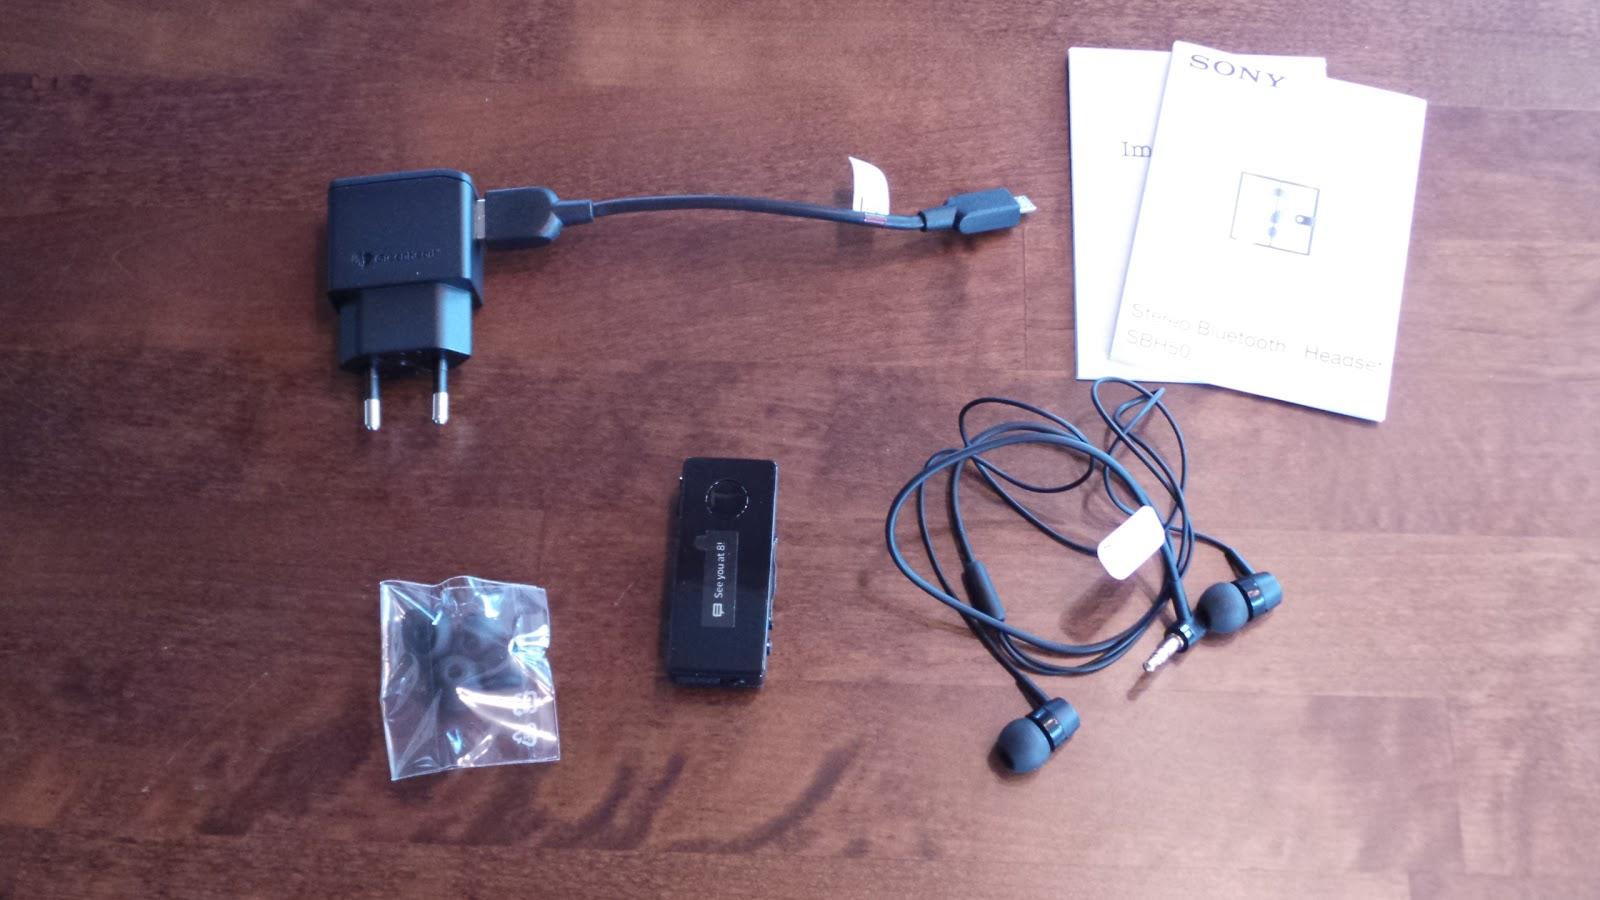 Sony Mw600 Manual Printed Circuit Board Cleaner Spray Tc 23 500 Ml Shopcluescom Array Sbh50 Superior Bt Headset Rh Teemuotala Blogspot Com